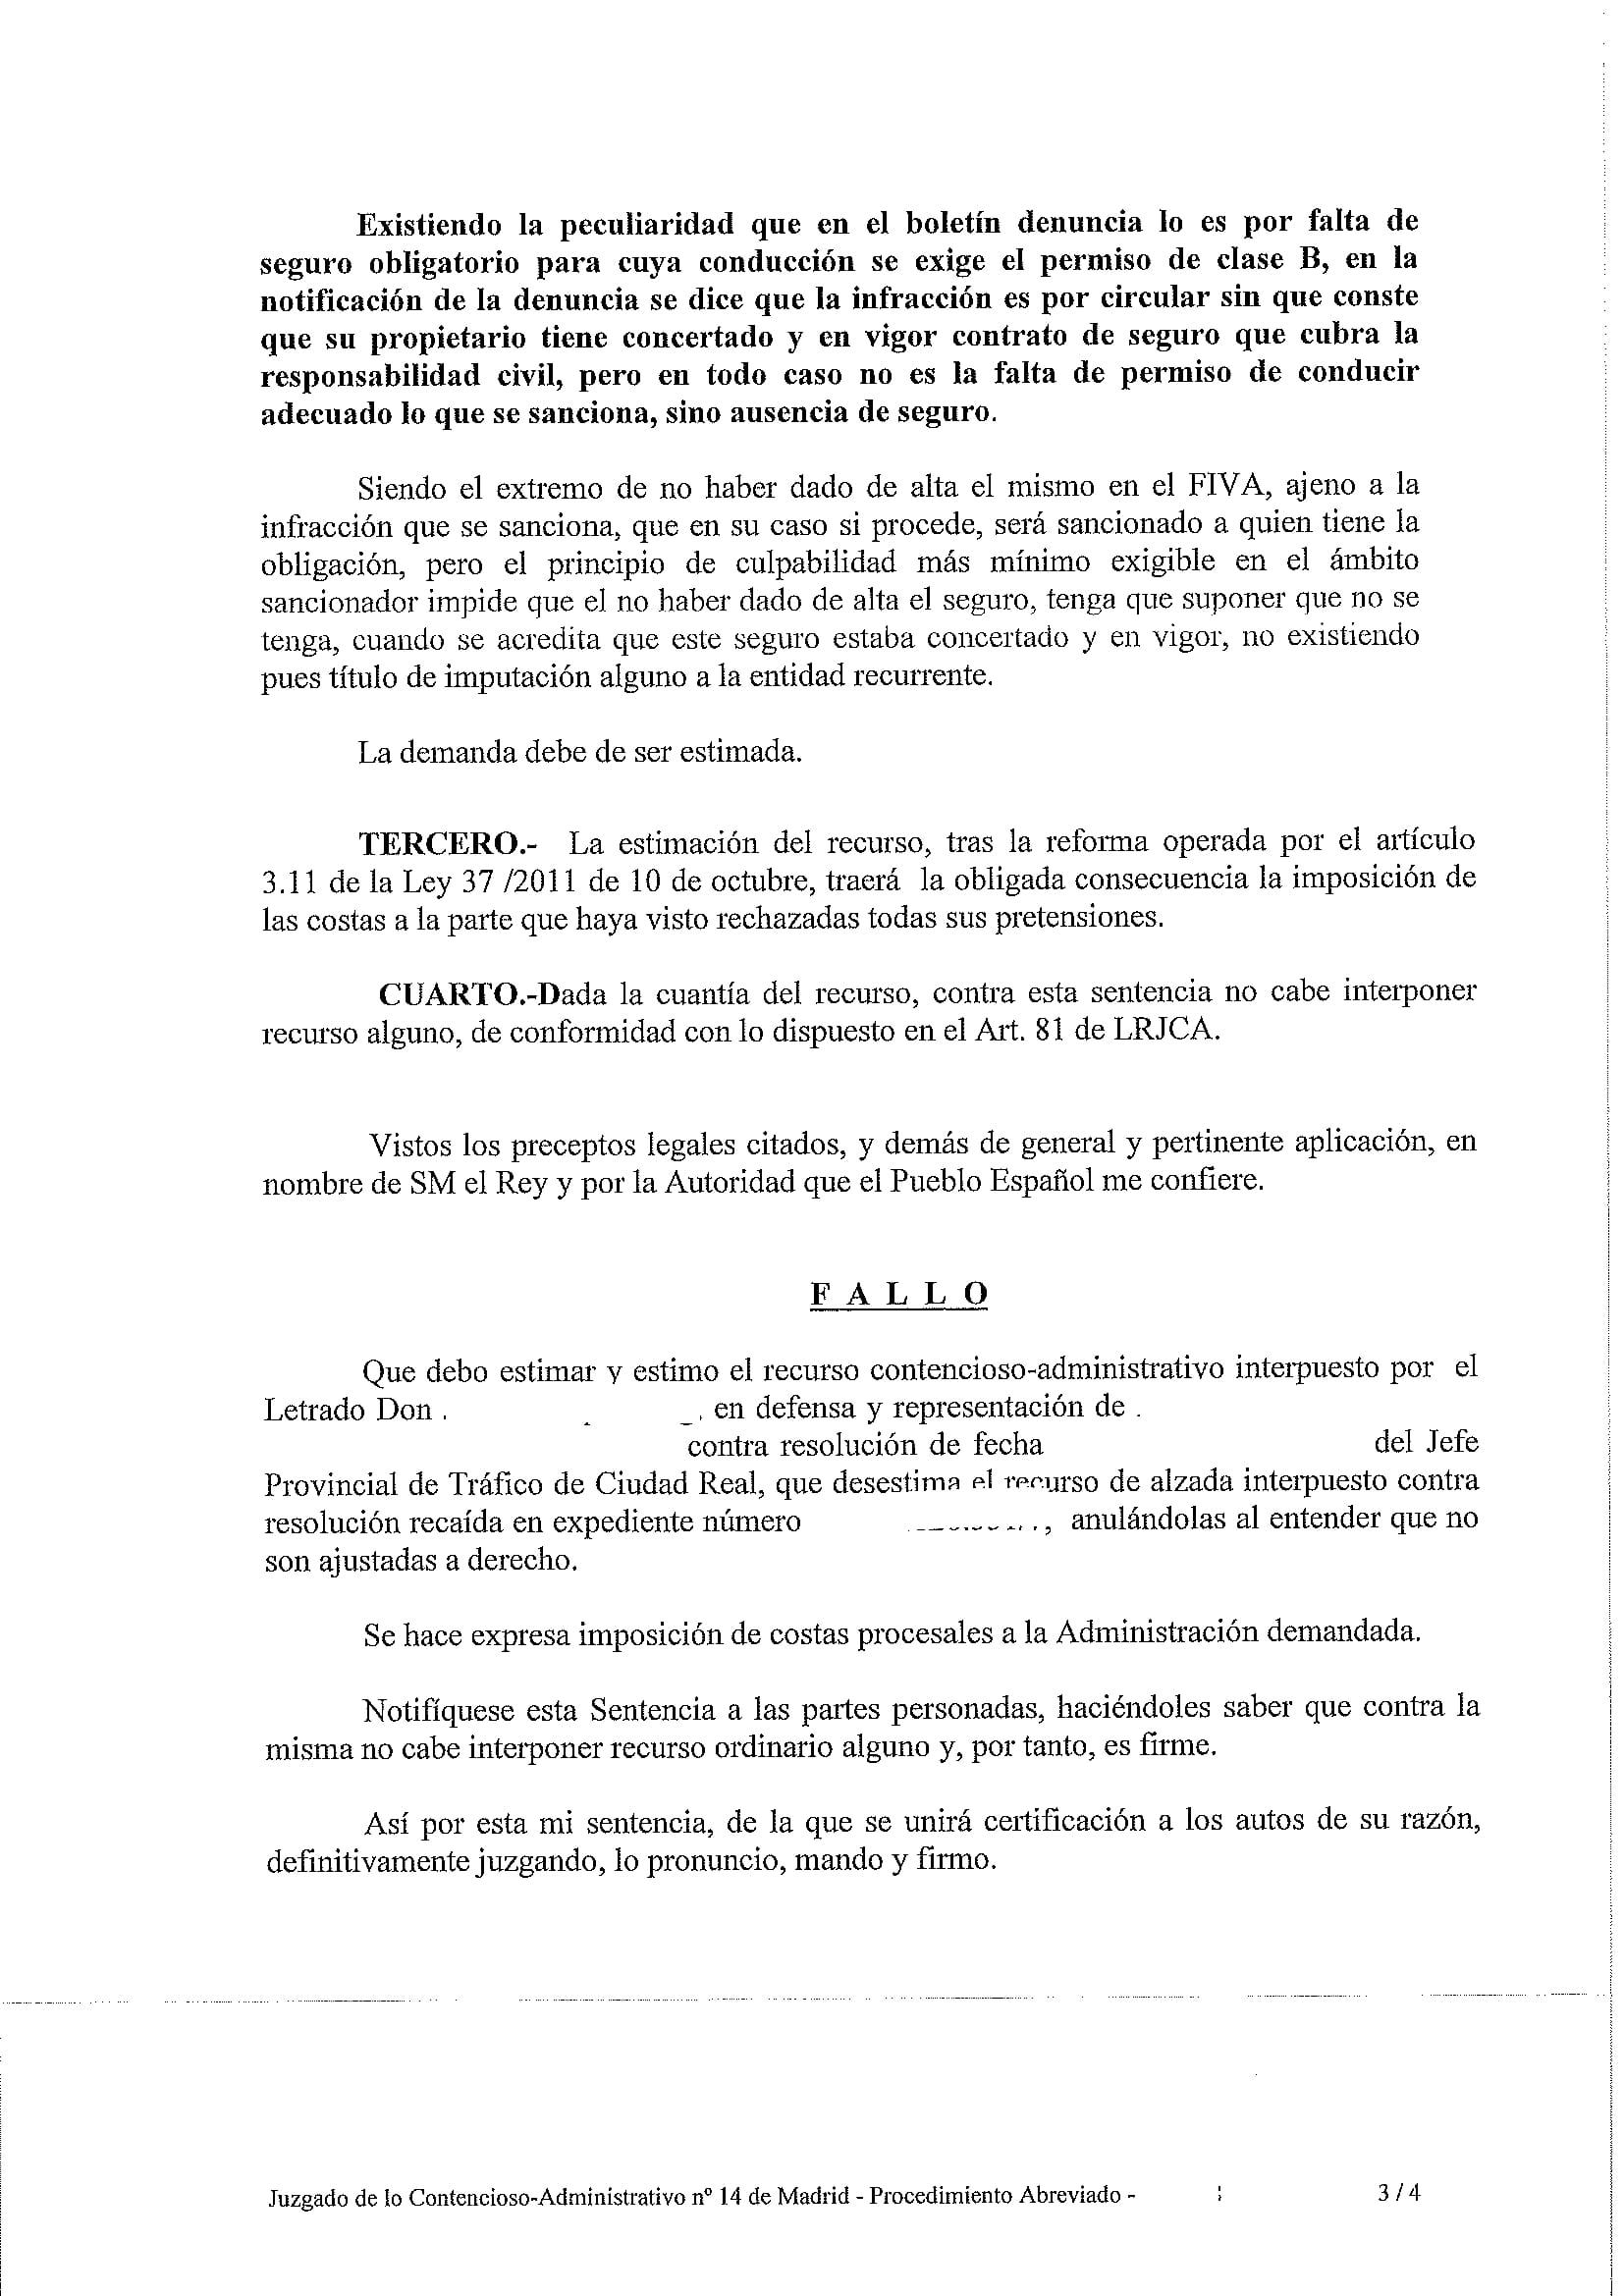 190521-seguro-3